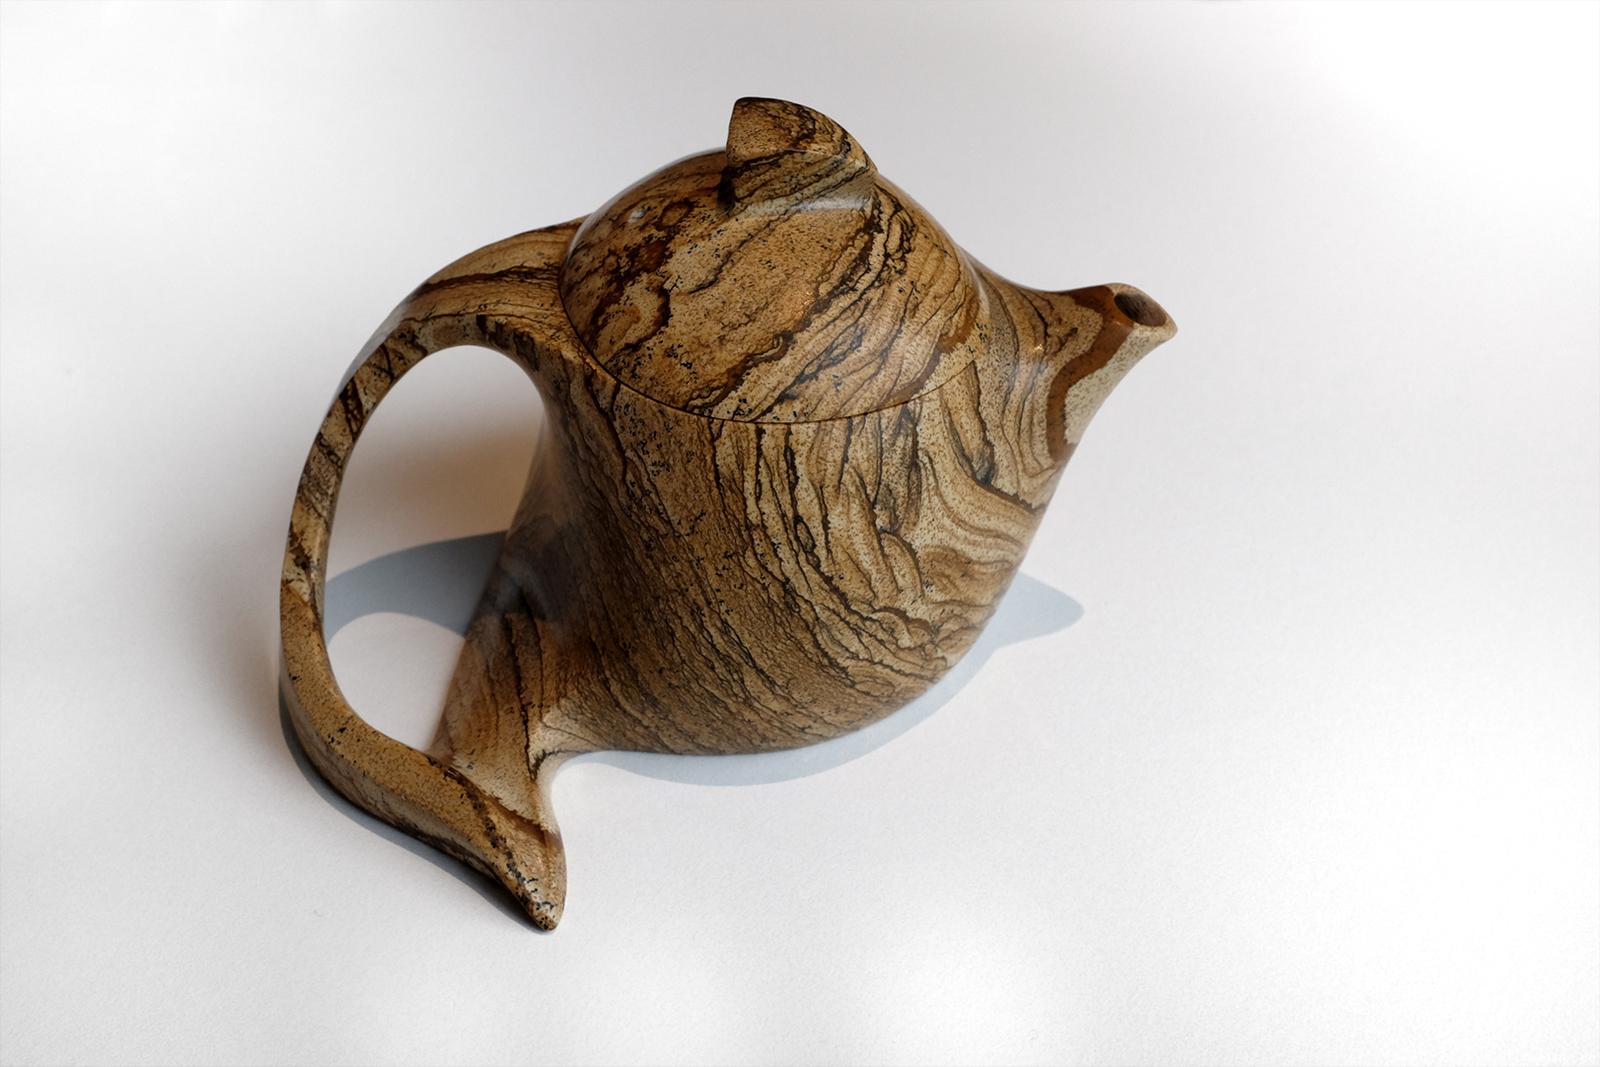 Taiwanesische Teekanne aus Jaspis (Lin Guoxiang, 林国祥)